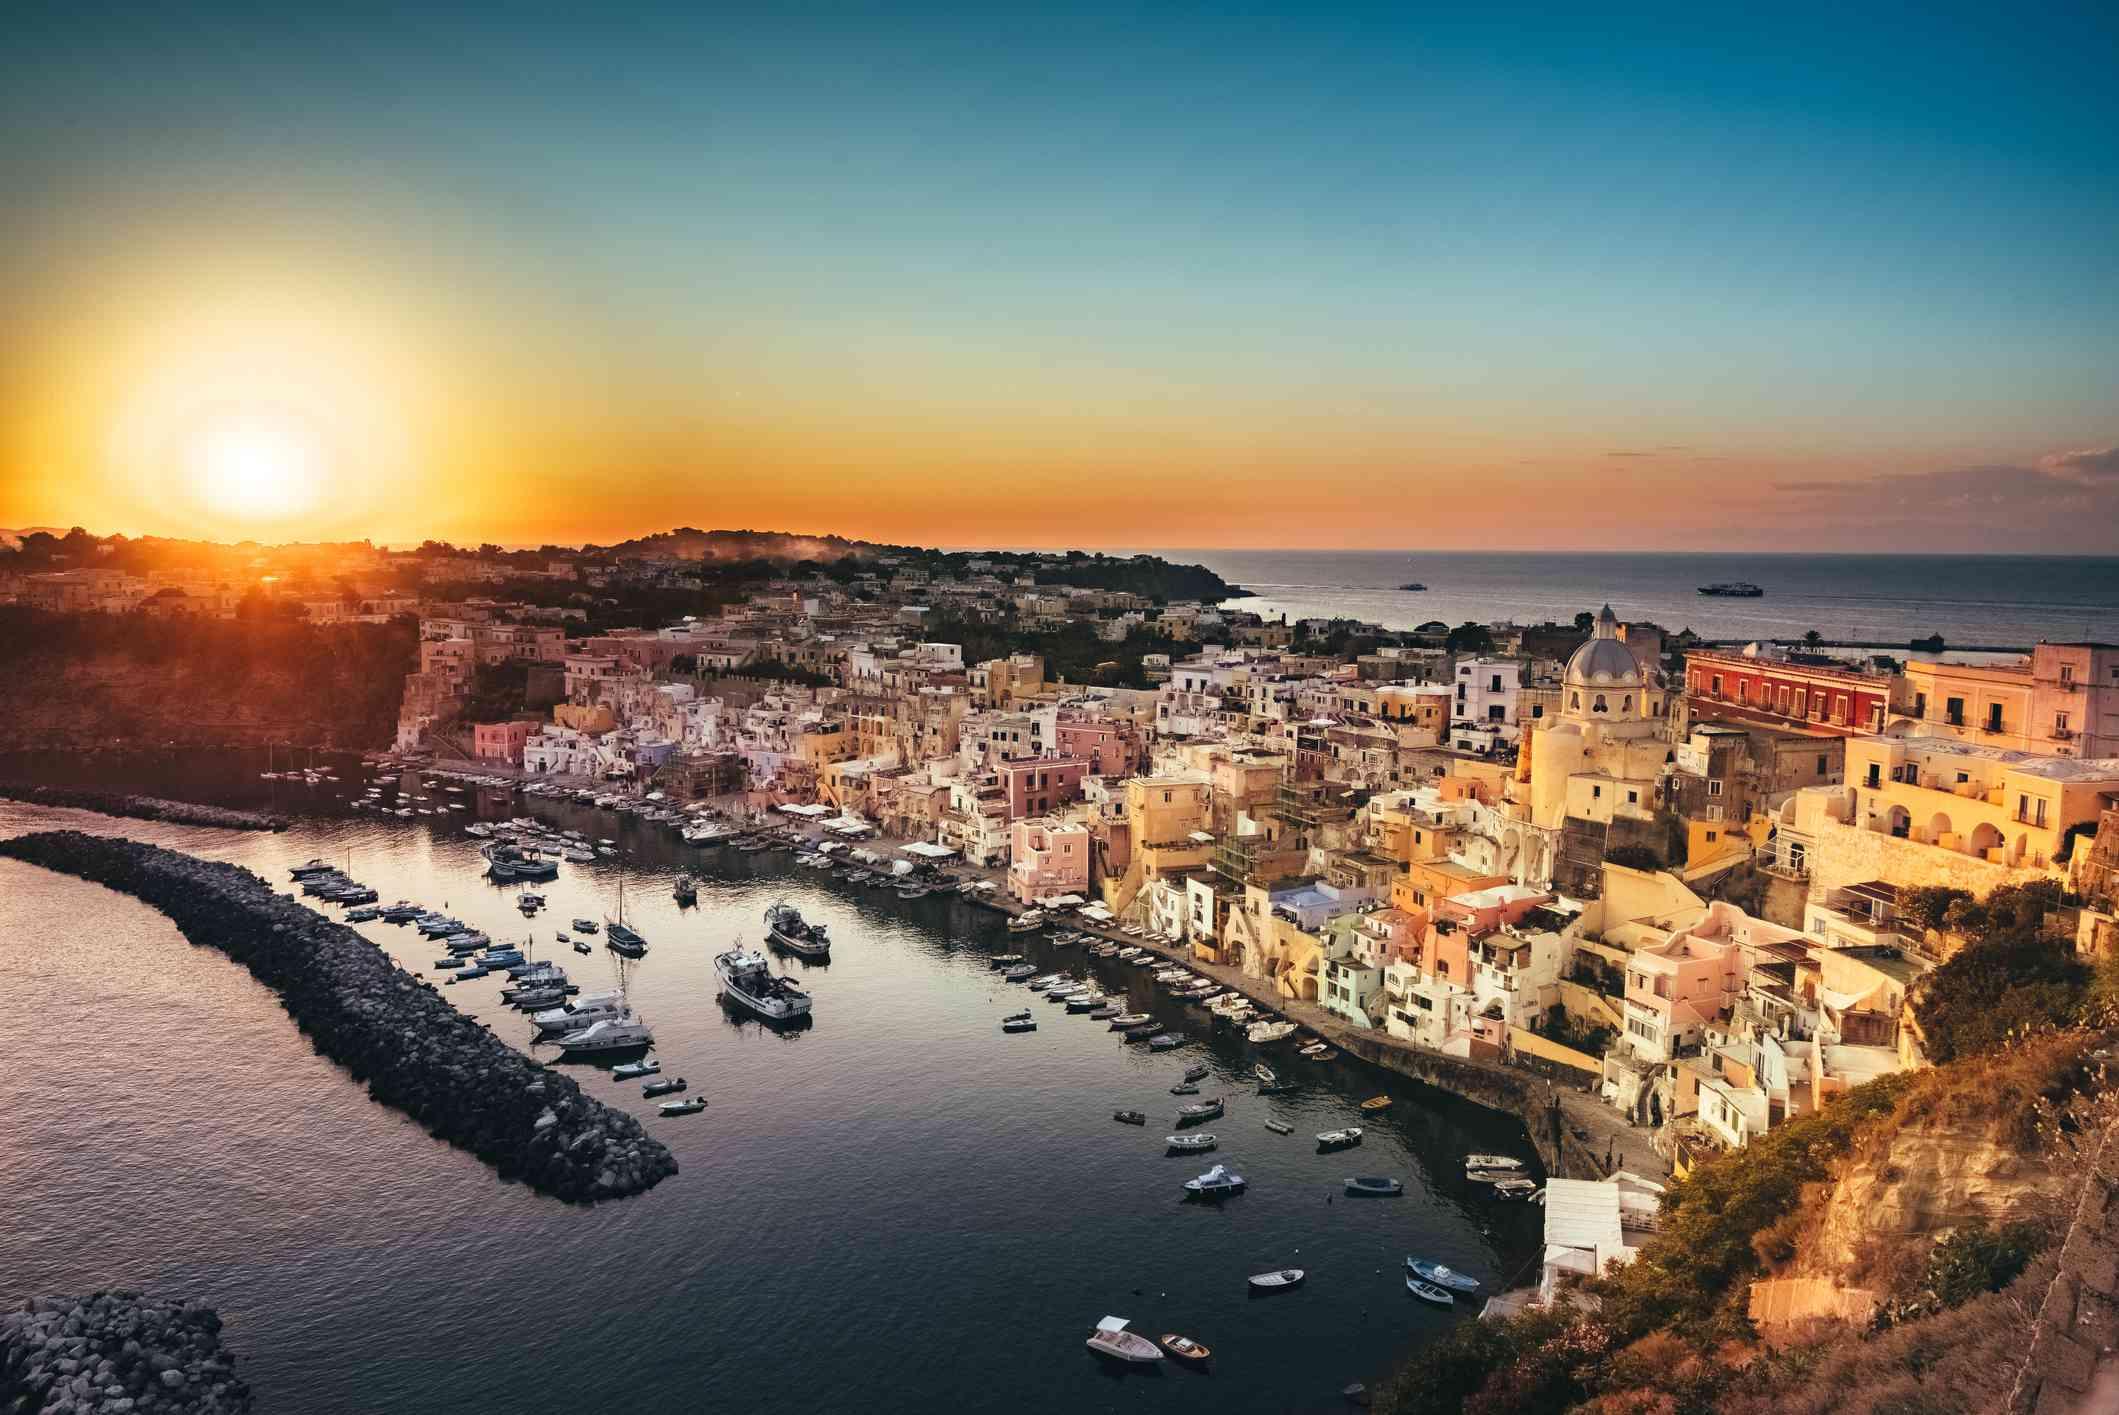 Sunset over the Marina Corricella, Procida island, Italy